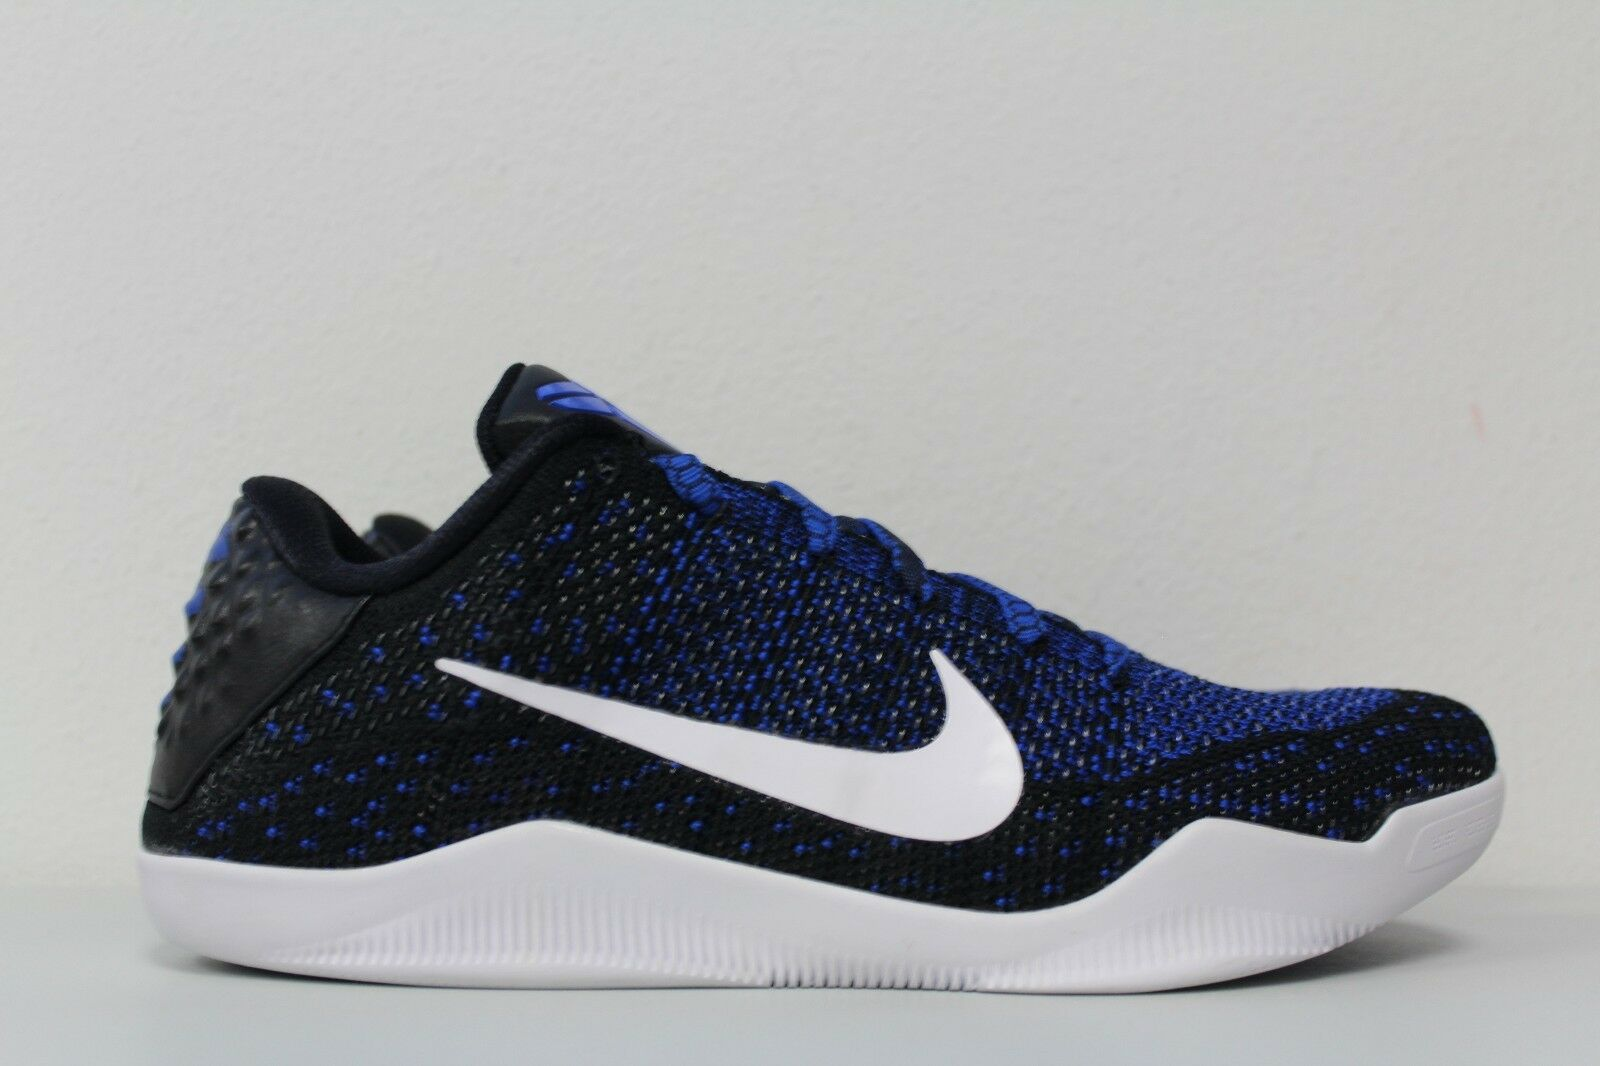 Nike Mens Kobe XI Elite Low Mark Parker Racer Blue 822675-014 Sz 9.5